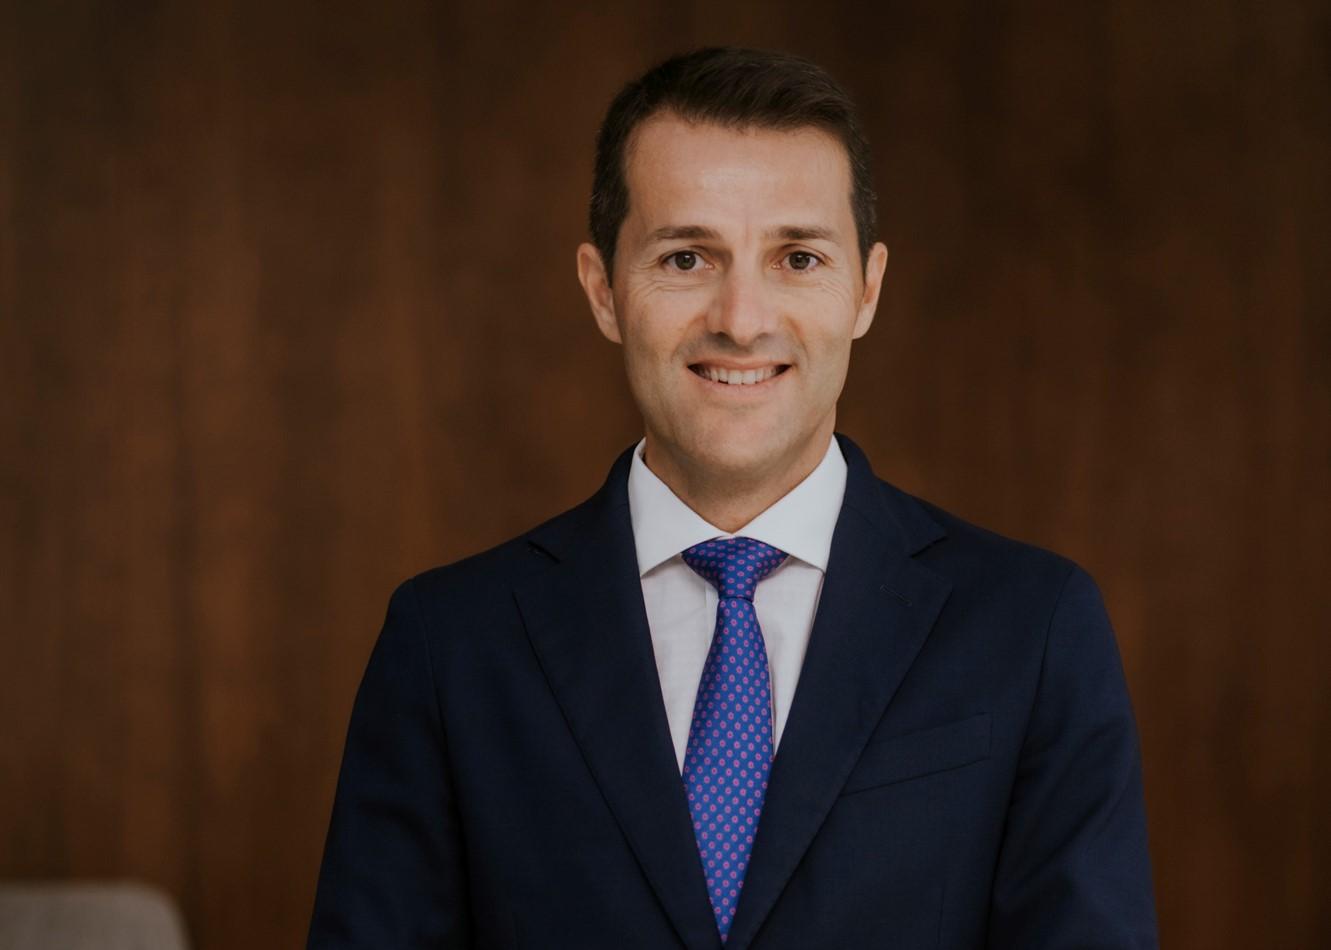 IMPORTACO RECORDS ANNUAL TURNOVER OF €661 MILLION